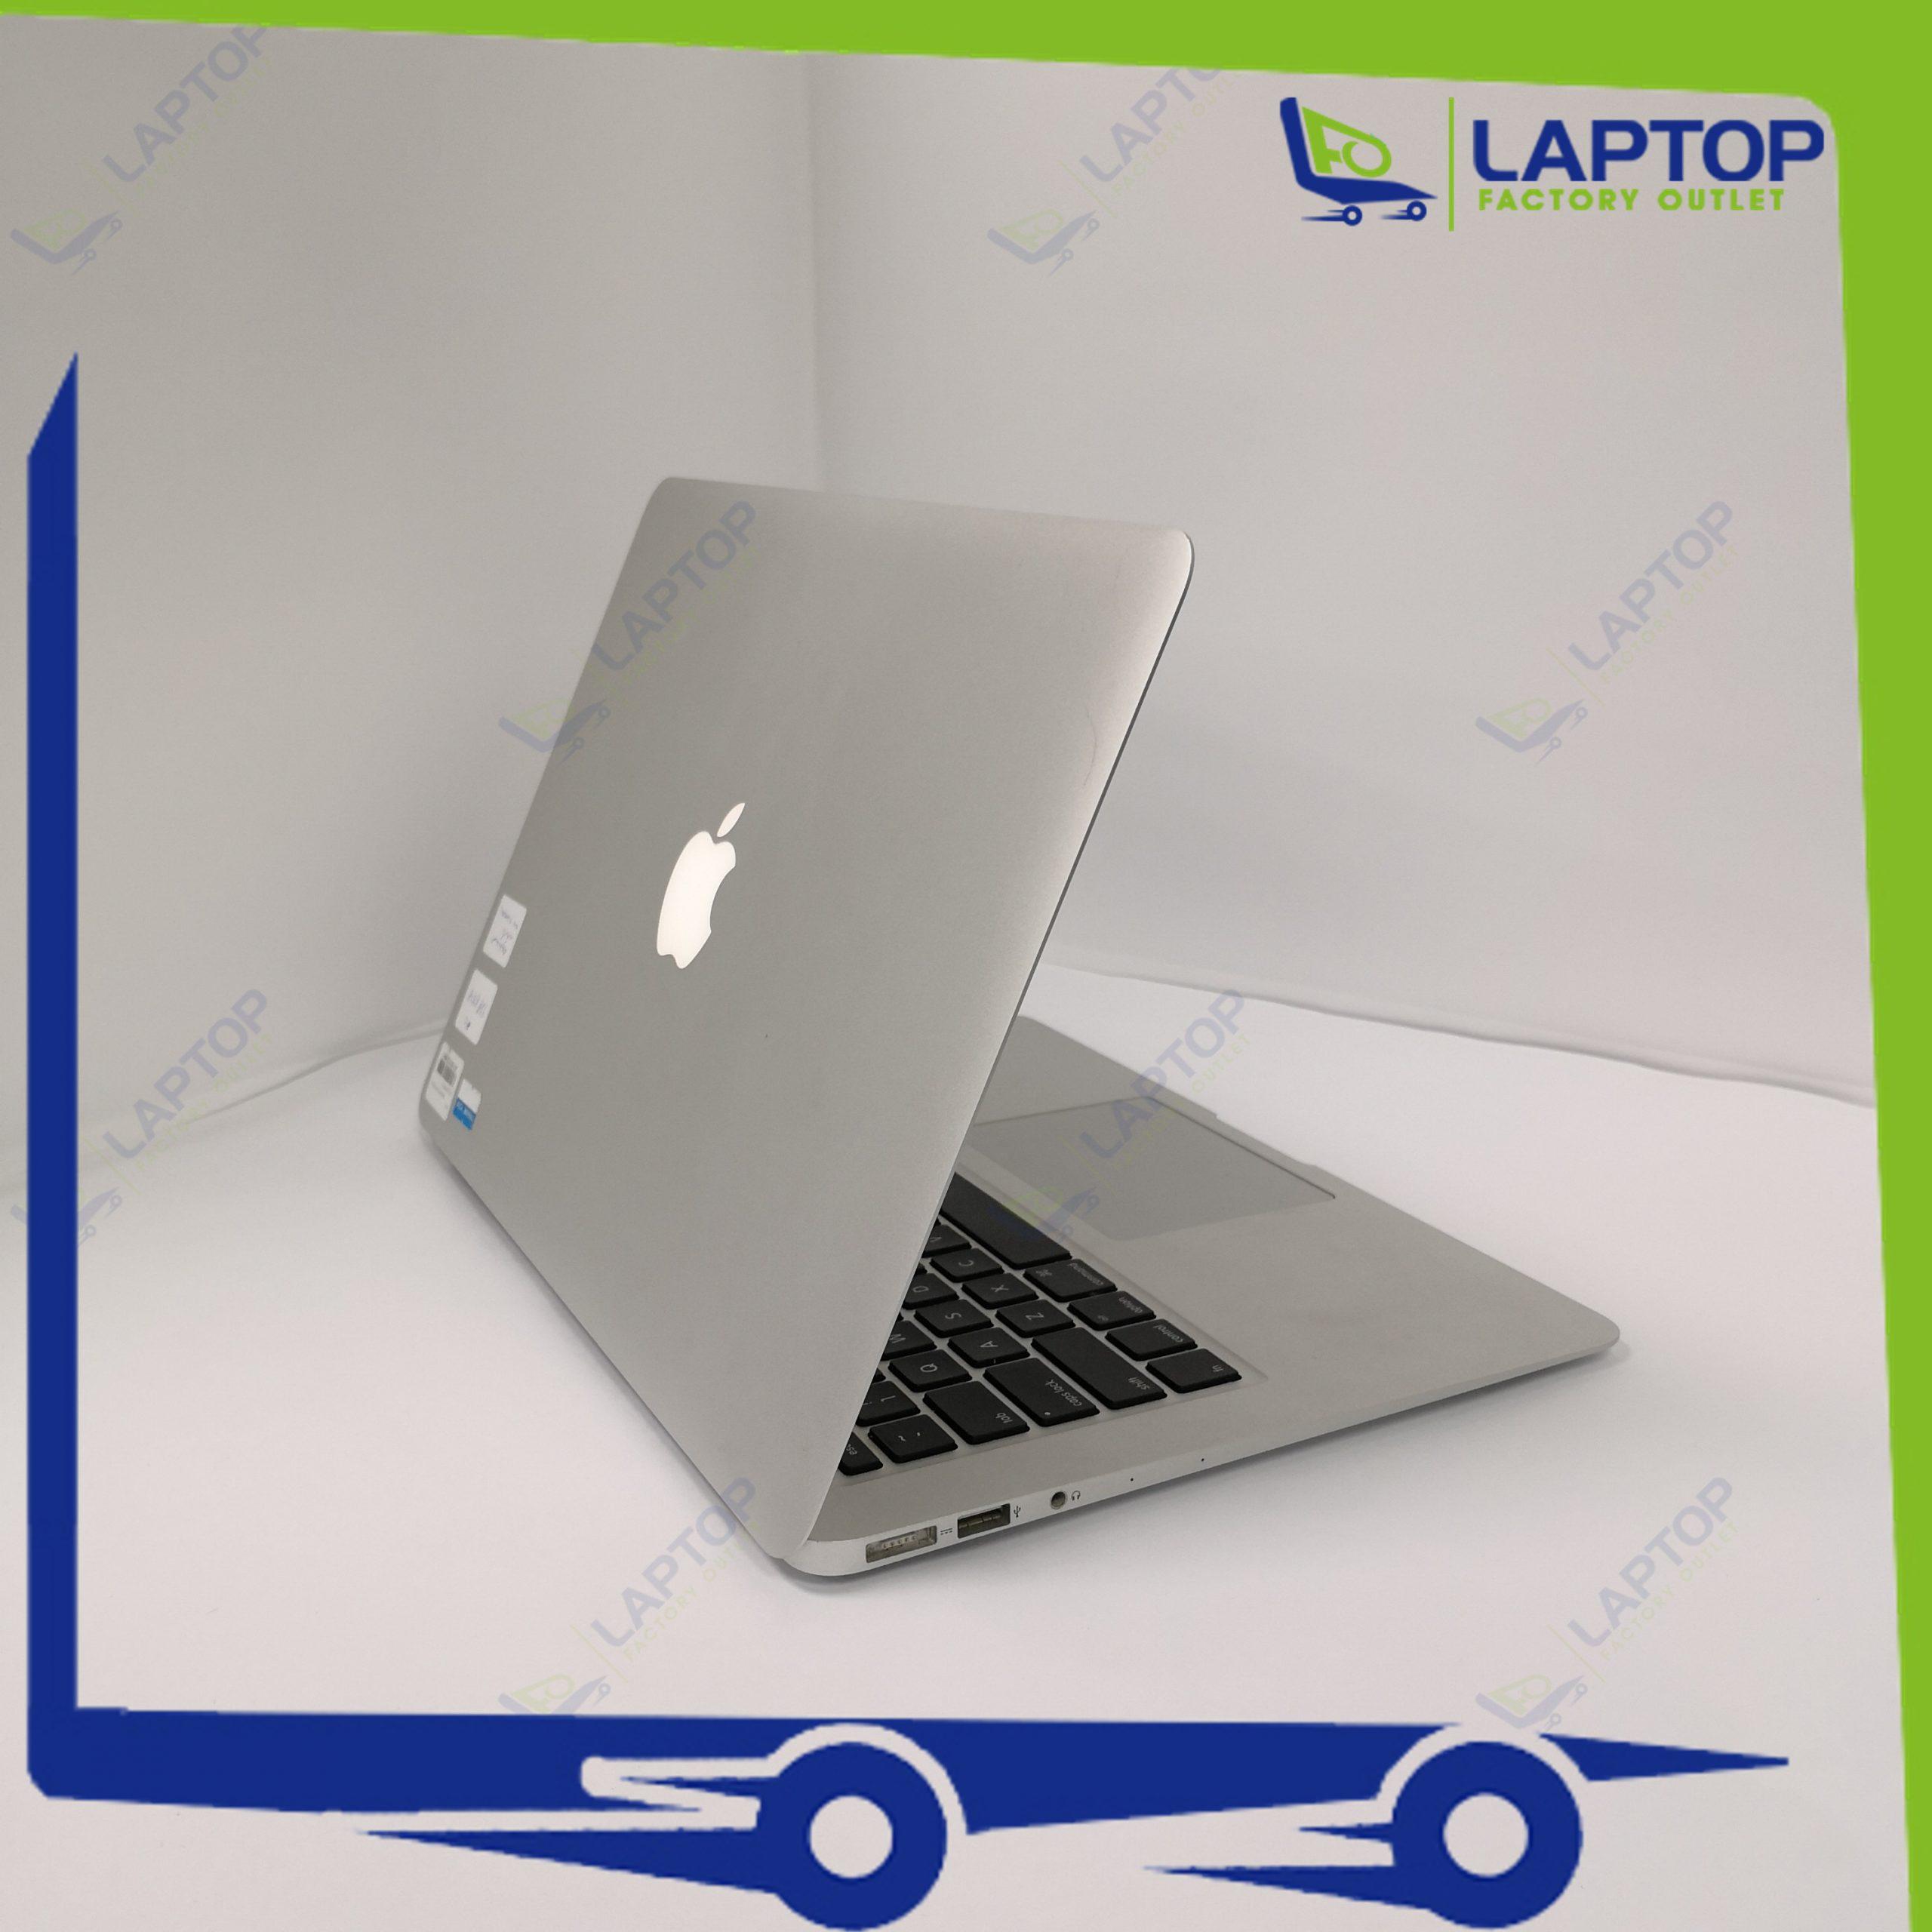 APPLE MacBook Air 13 (i5/8GB/256GB/Mid-2013) [Preowned]